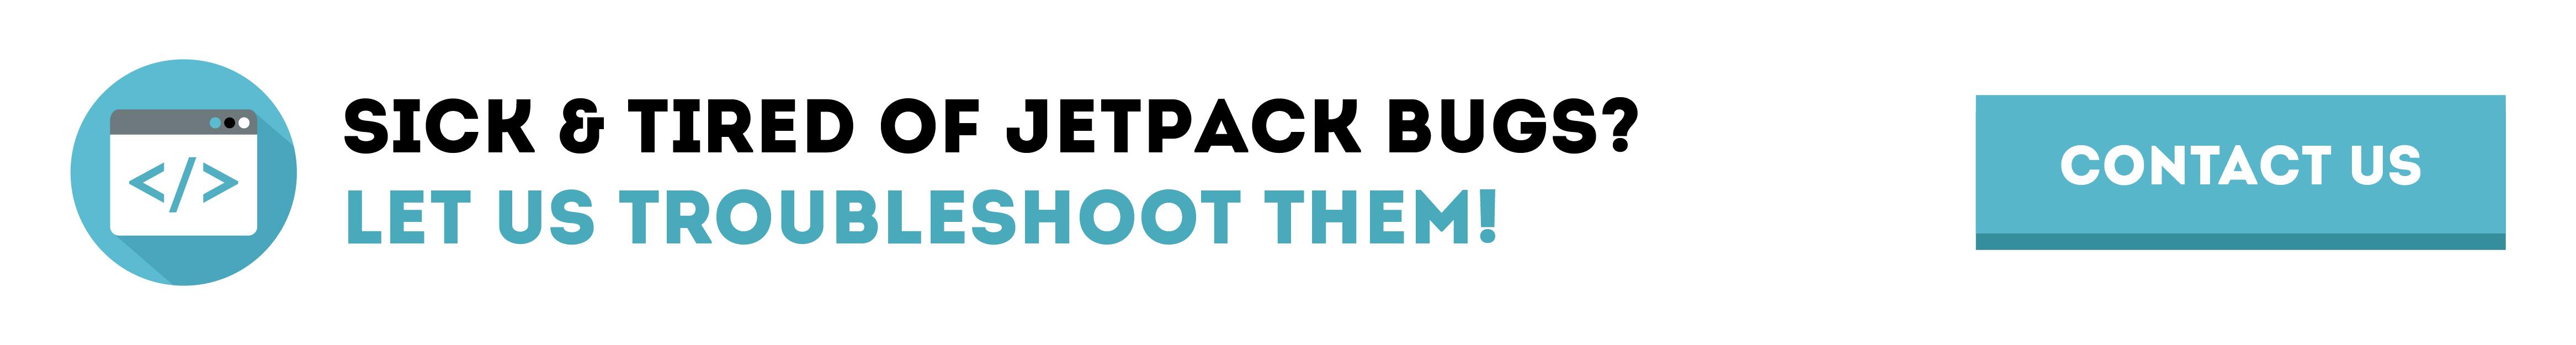 jetpack bugs